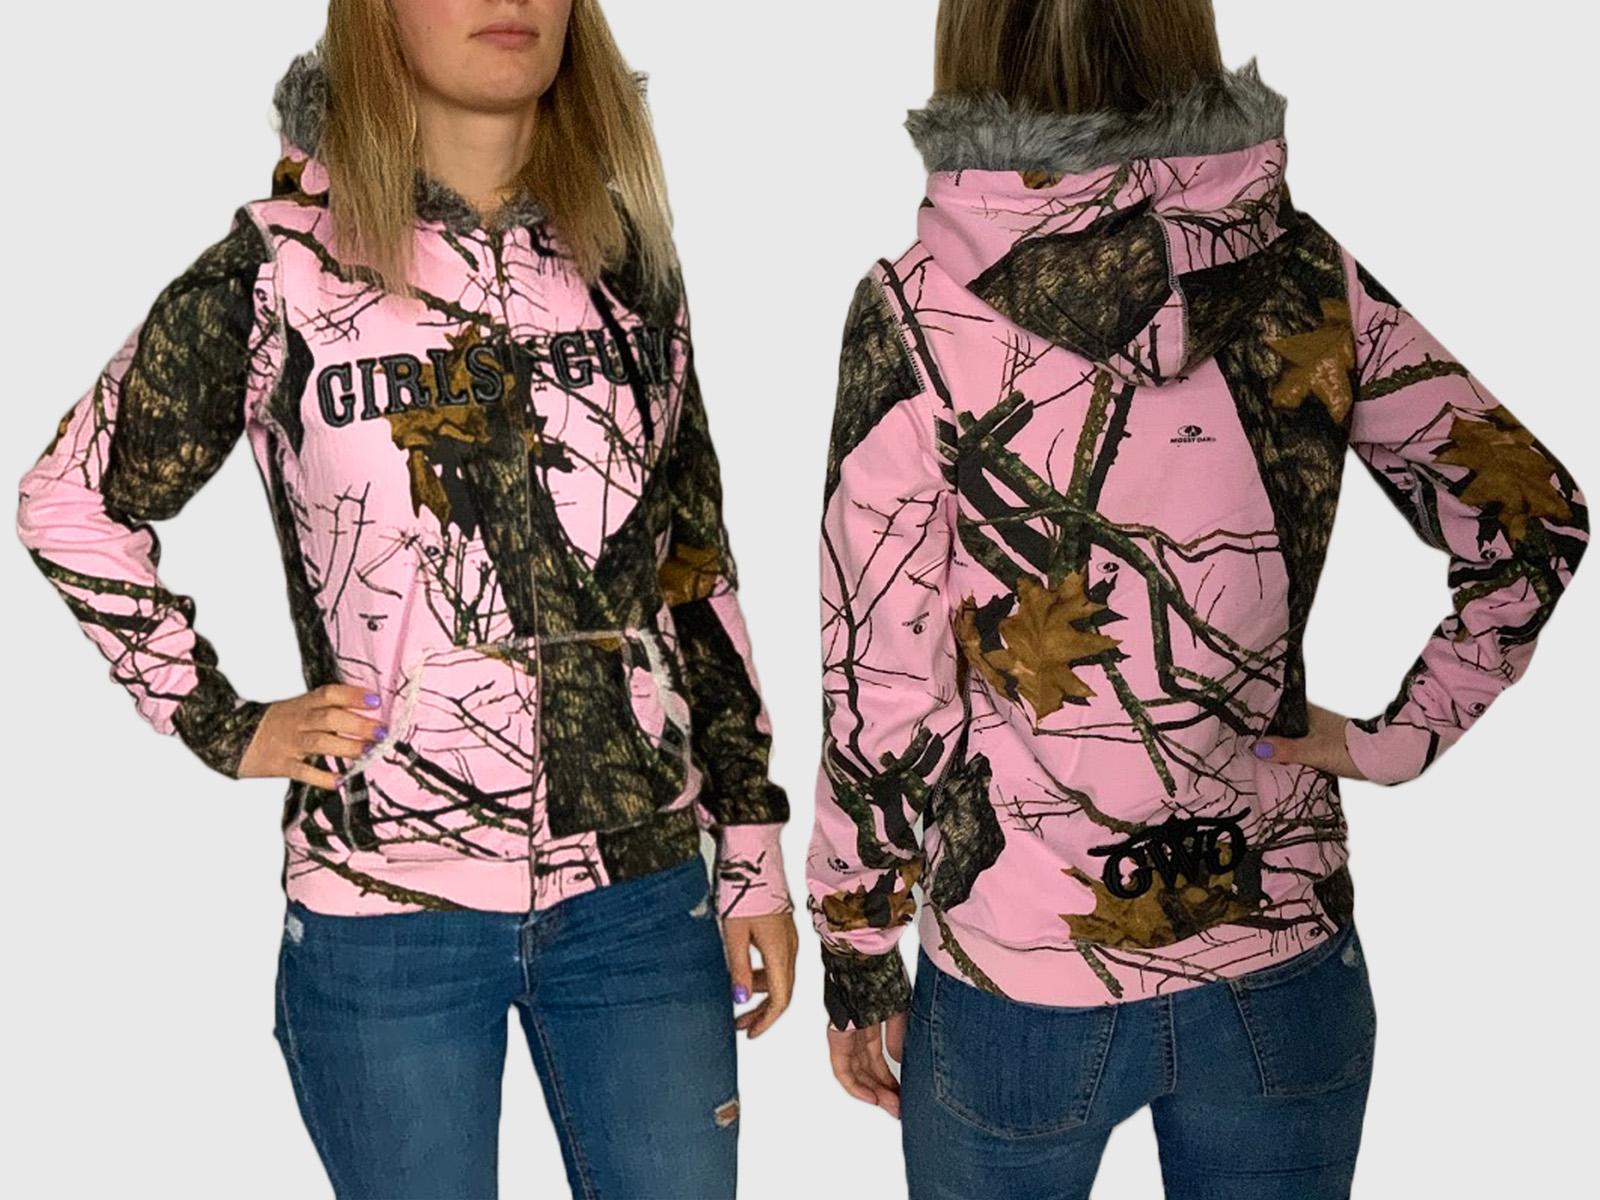 Женская милитари толстовка Girls with guns